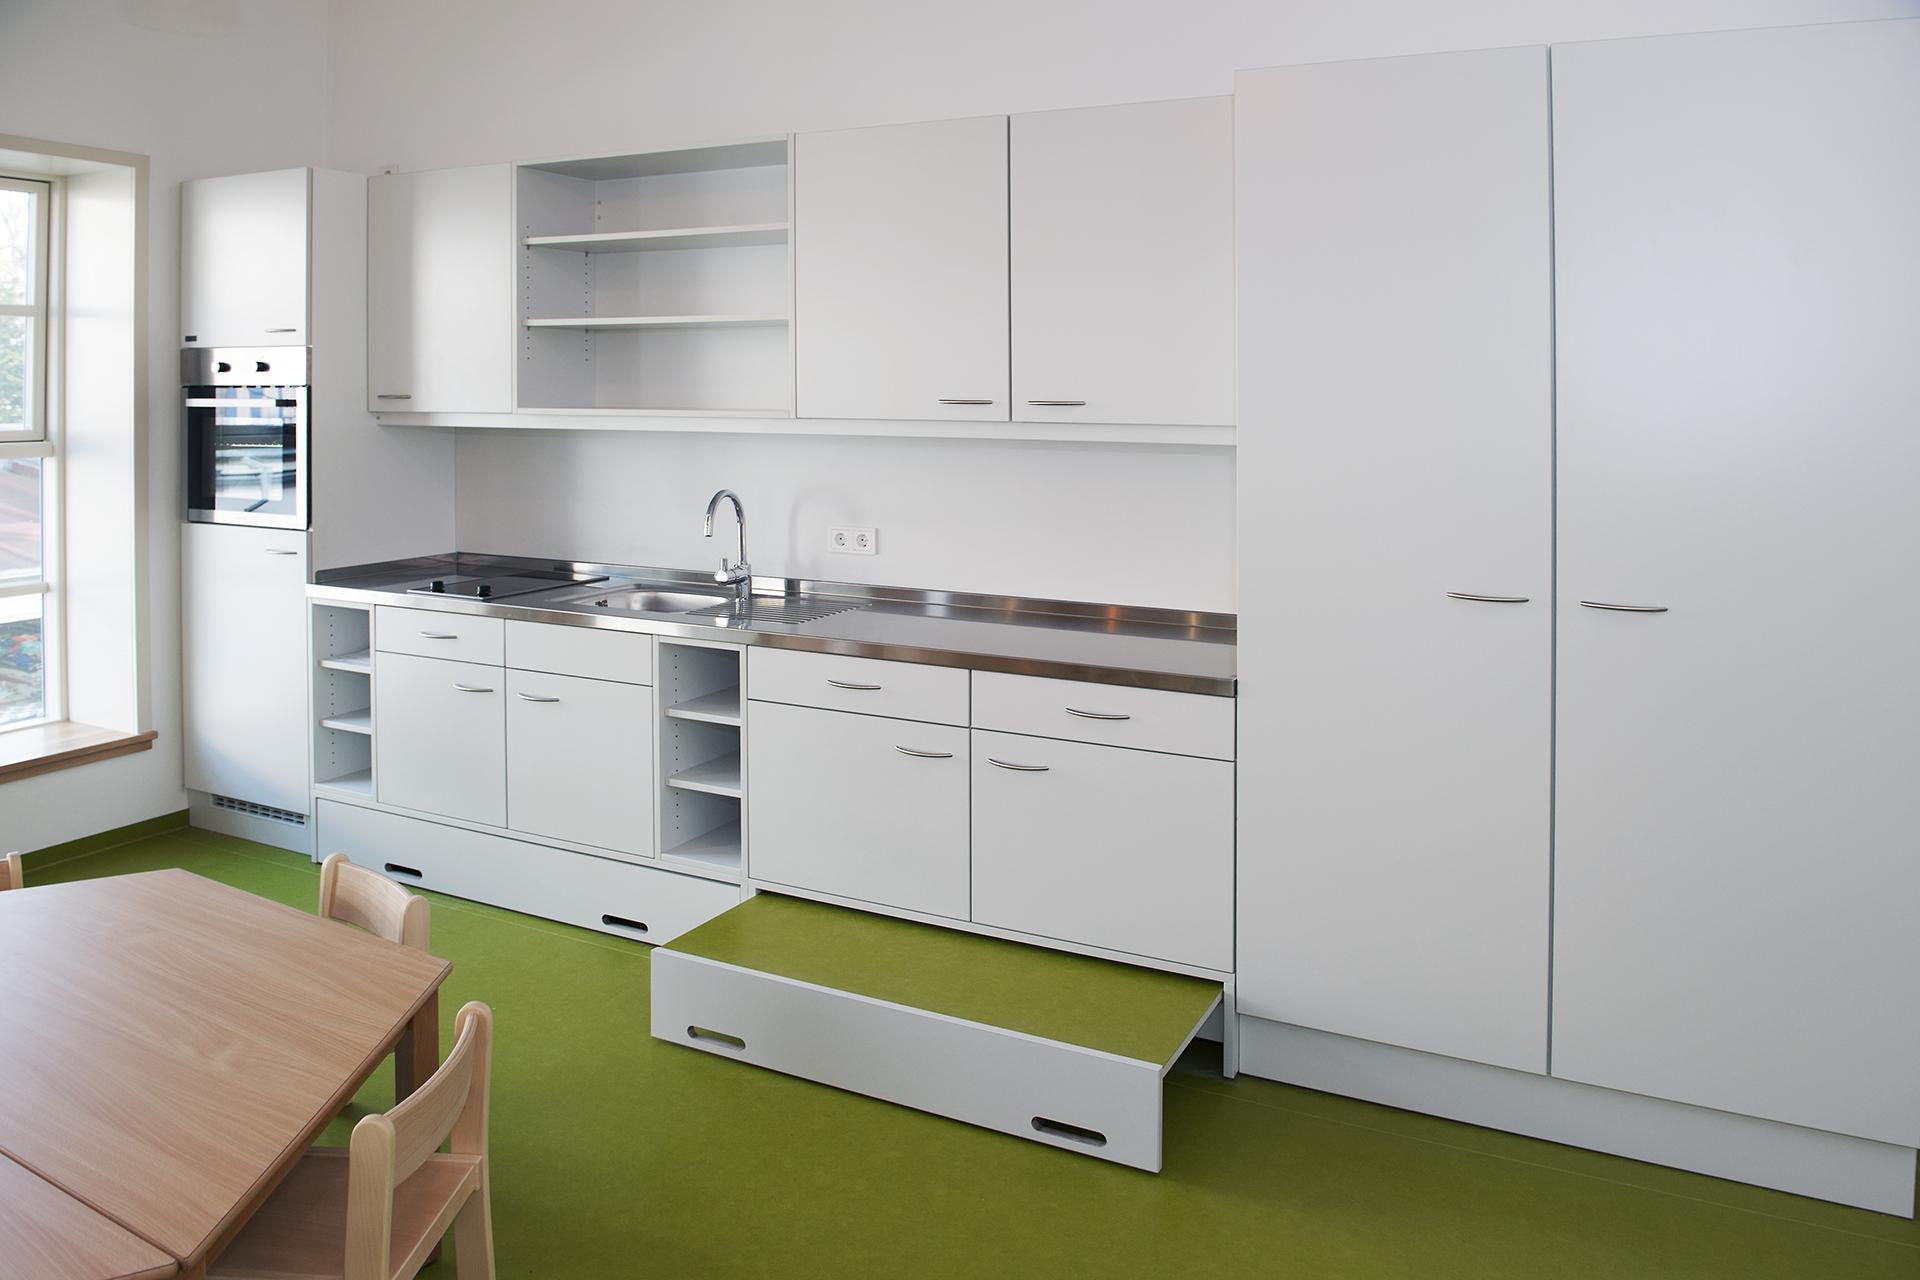 Koepke und Koepke Kita Küche 01